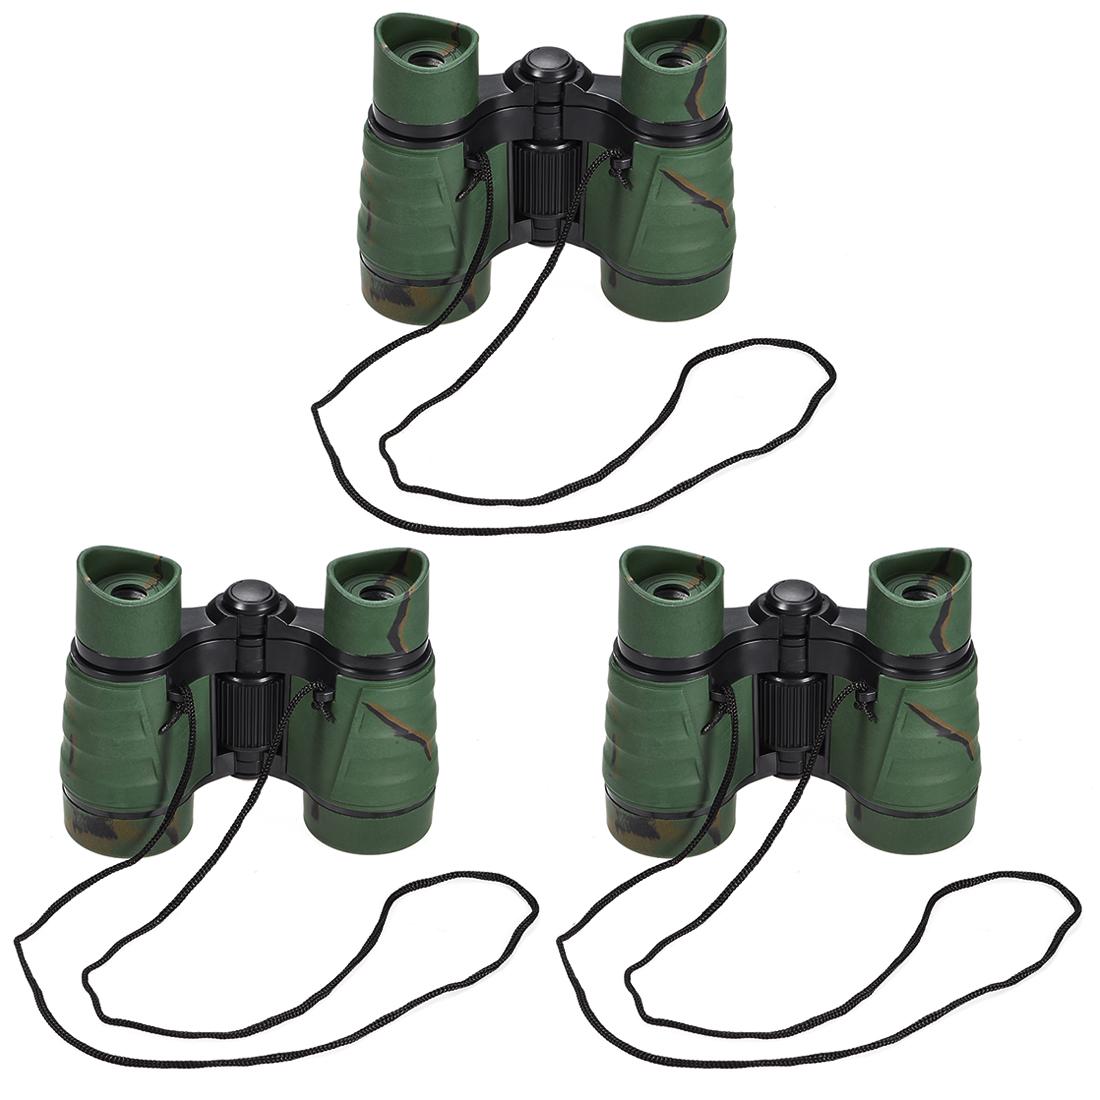 3pcs Toy Binoculars 4X30 Compact Foldable Binoculars Dark Green with Neck Strap